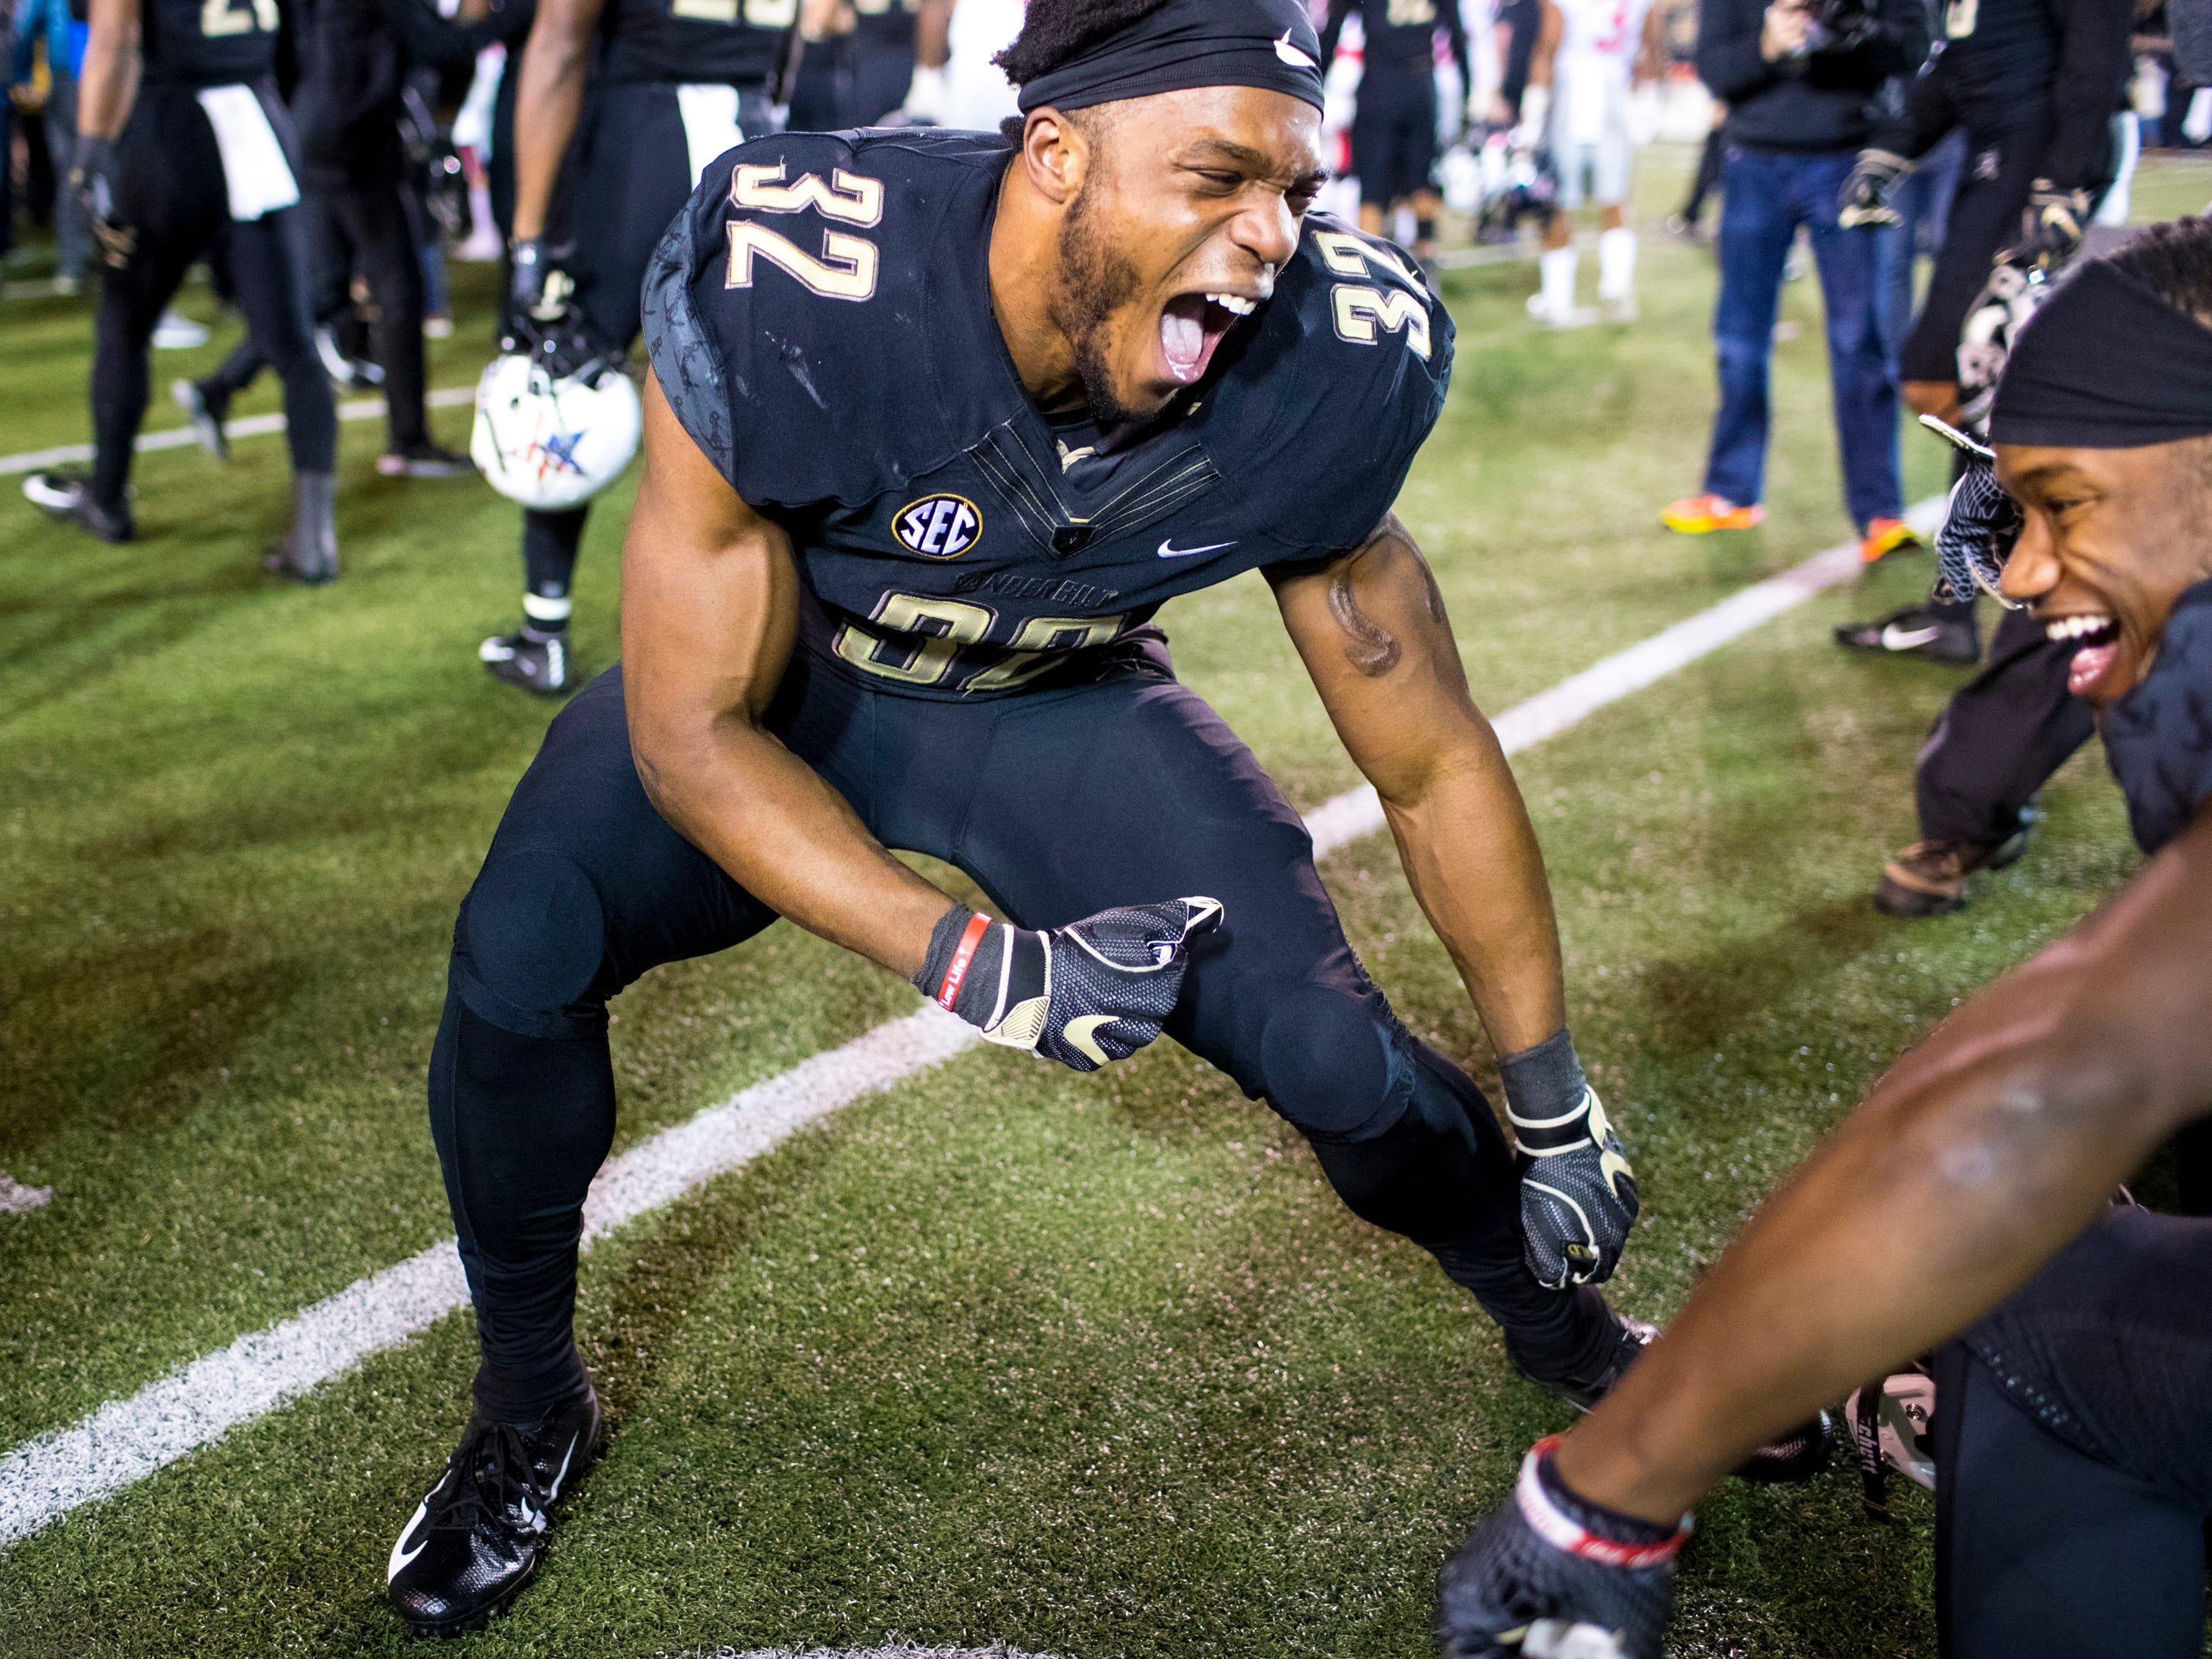 Vanderbilt running back Jamauri Wakefield (32) dances in celebration after Vanderbilt's game against Ole Miss at Vanderbilt Stadium in Nashville on Saturday, Nov. 17, 2018.